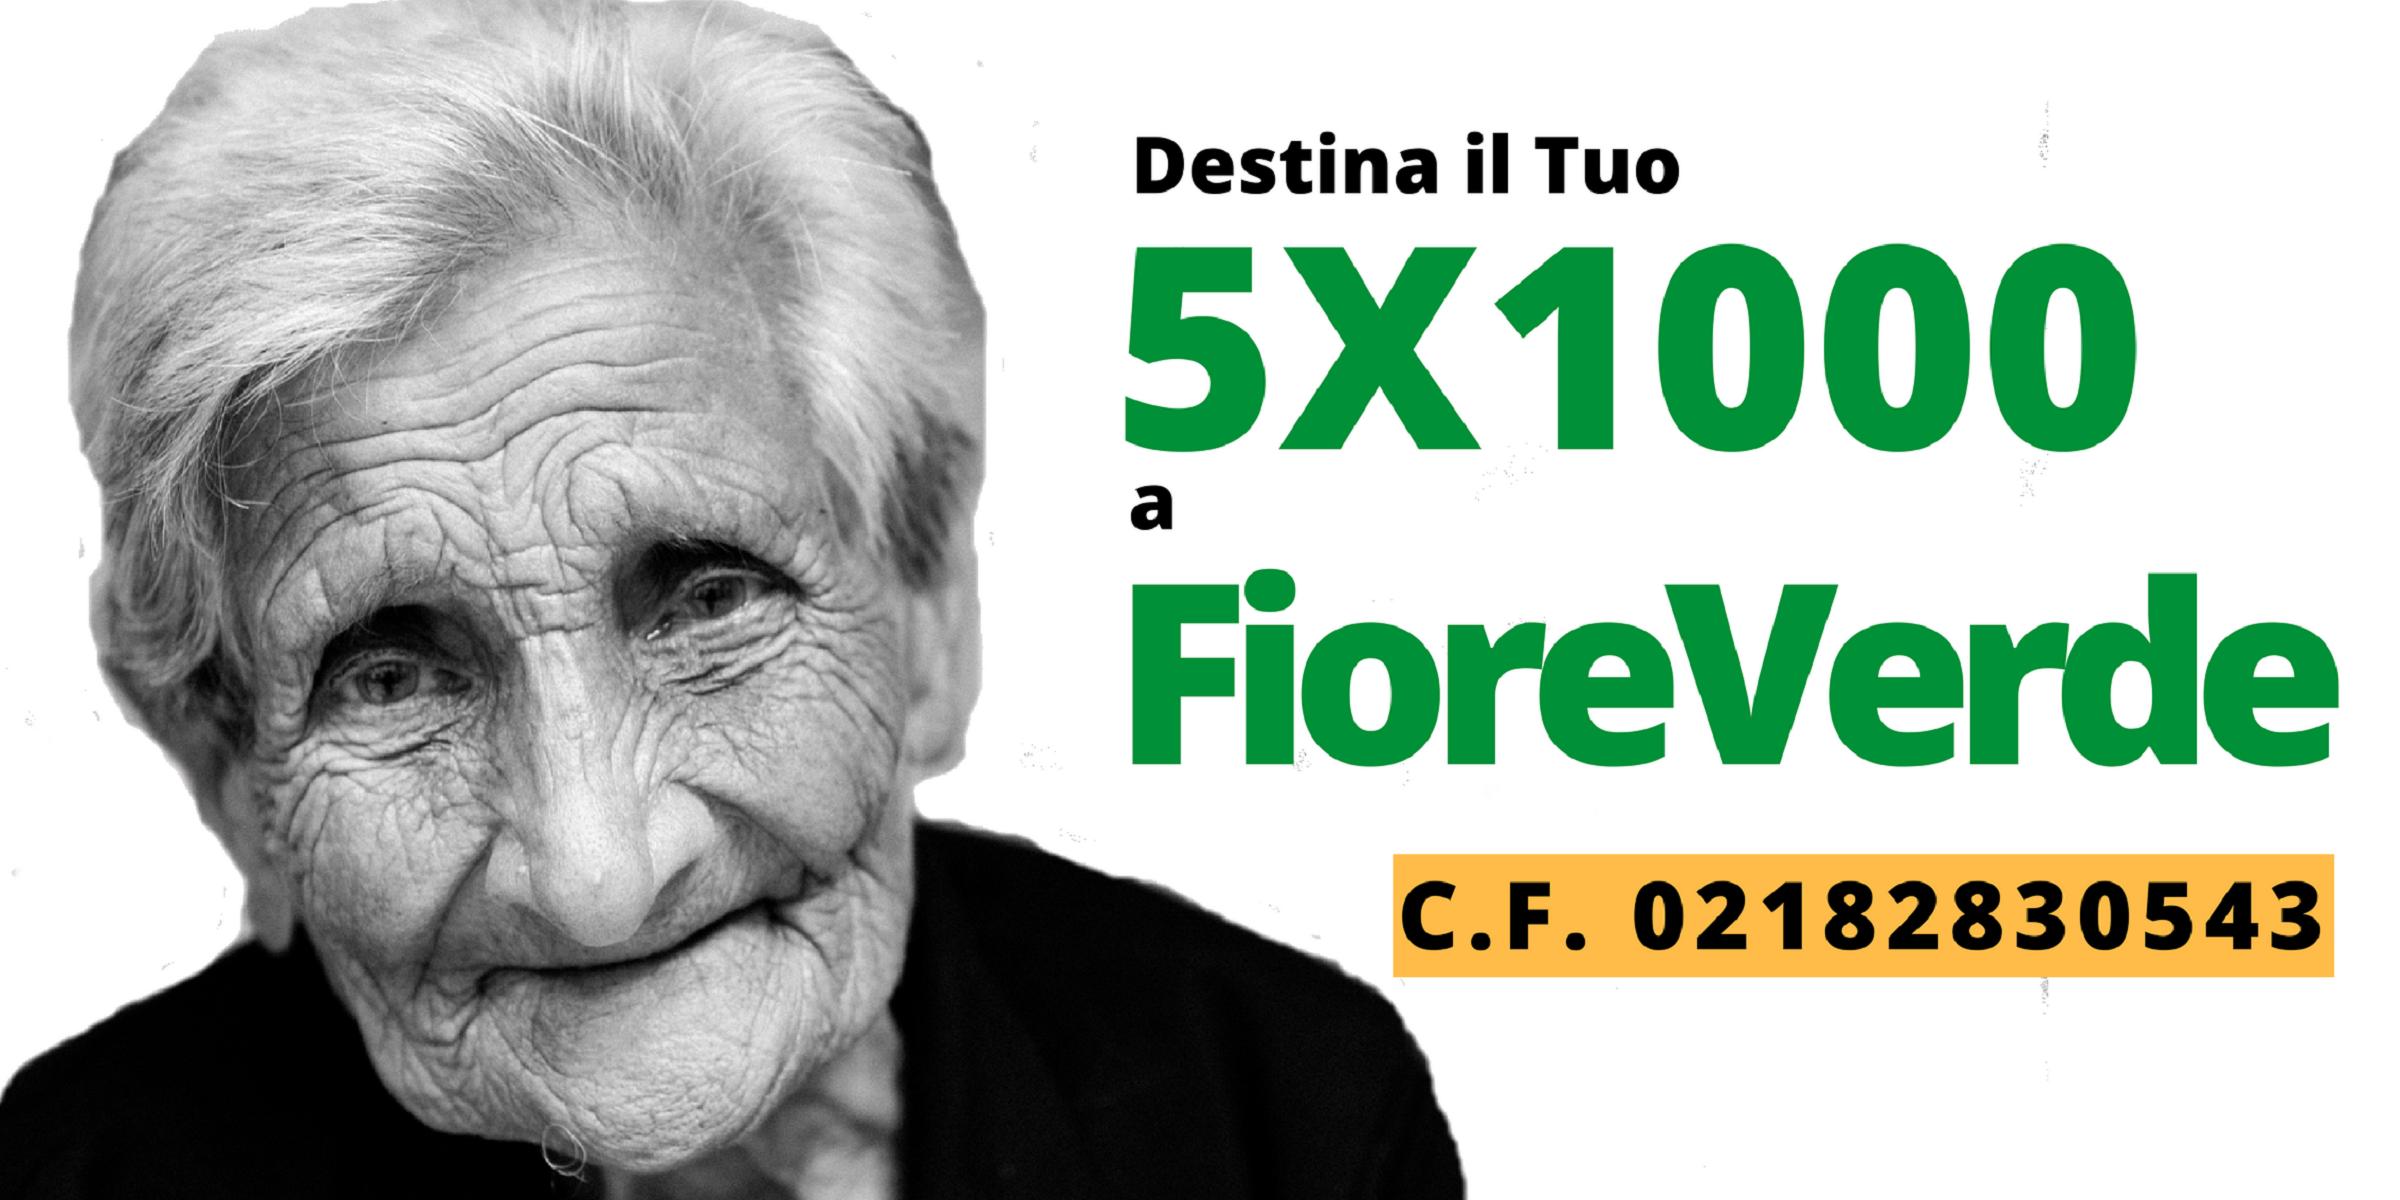 FIORE VERDE è una organizzazione SENZA SCOPO DI LUCRO libera e indipendente - C. F. / P. IVA 02182830543 - PEC fioreverde@pec.it